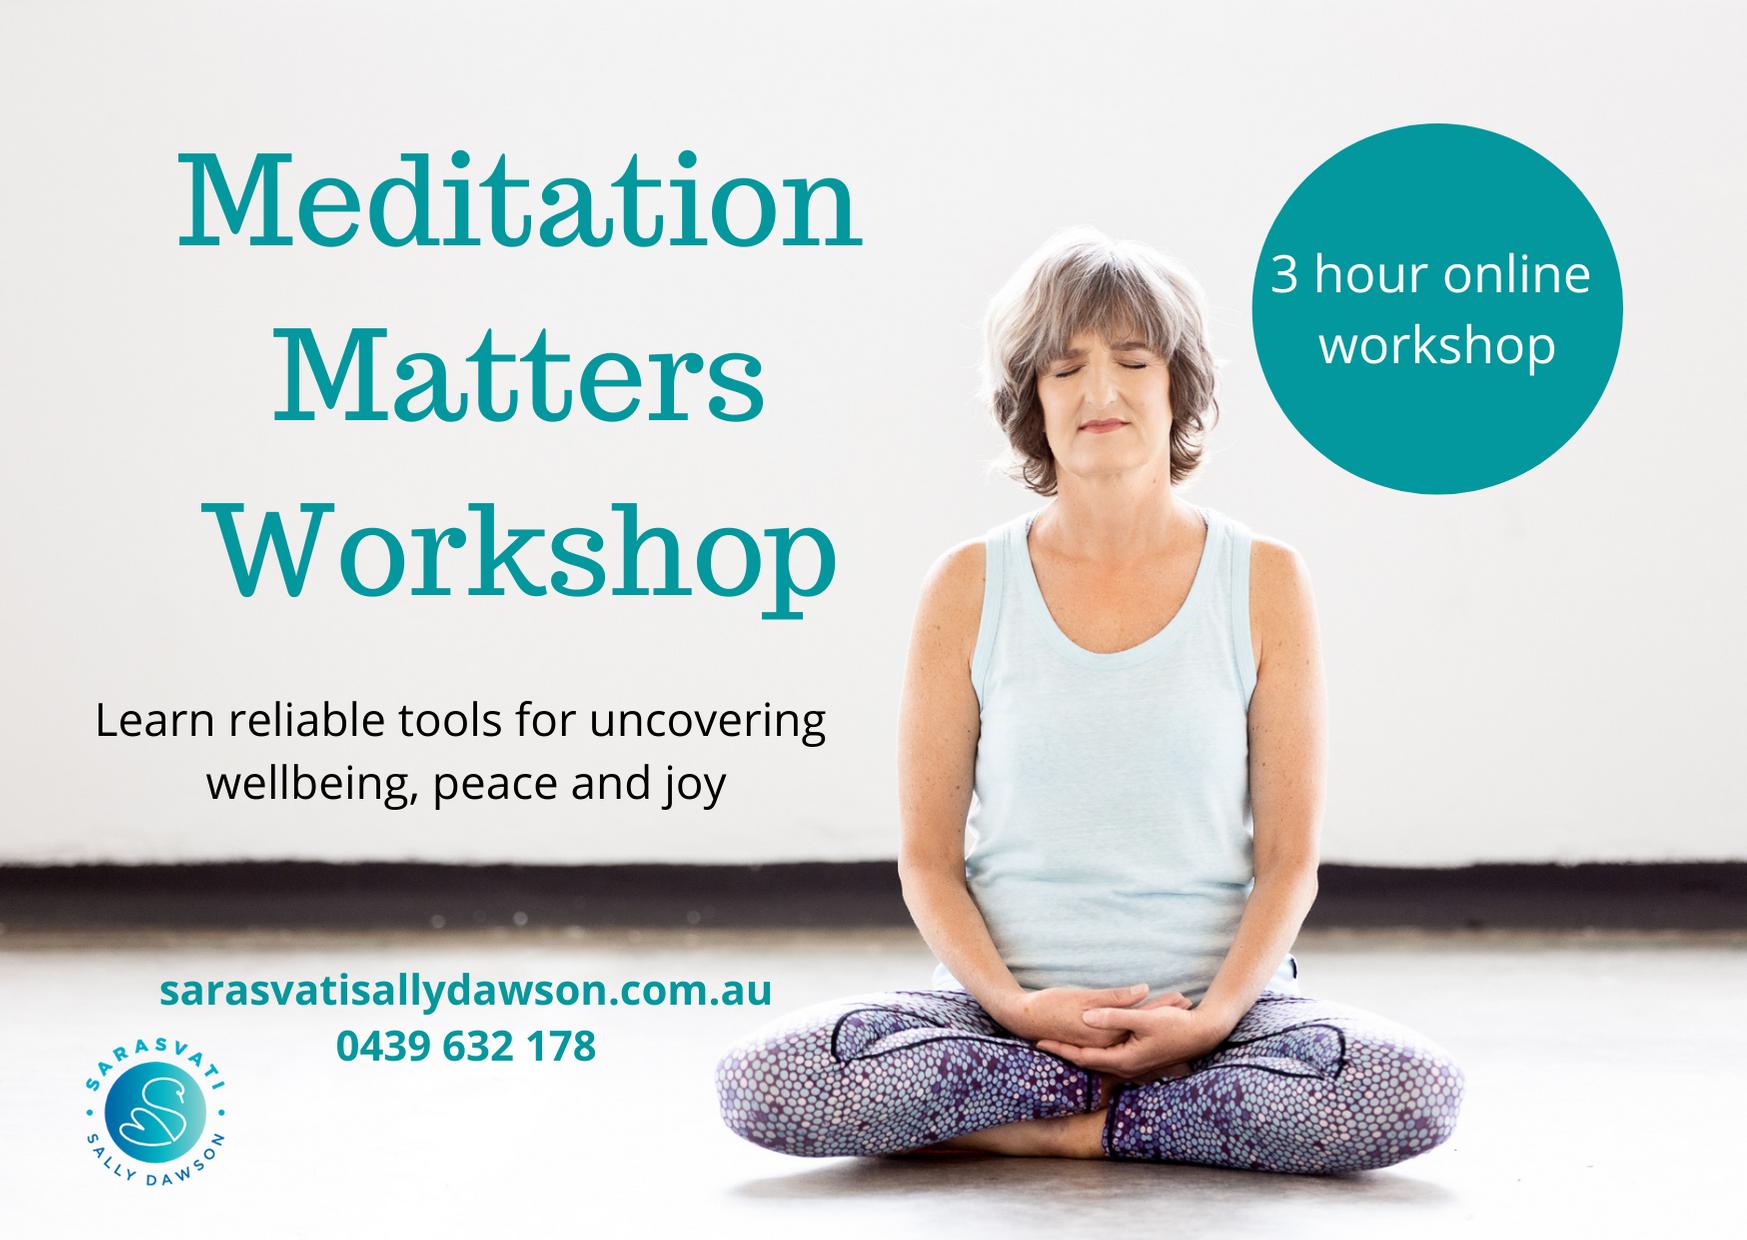 Meditation Matters Learn to Meditate Workshop